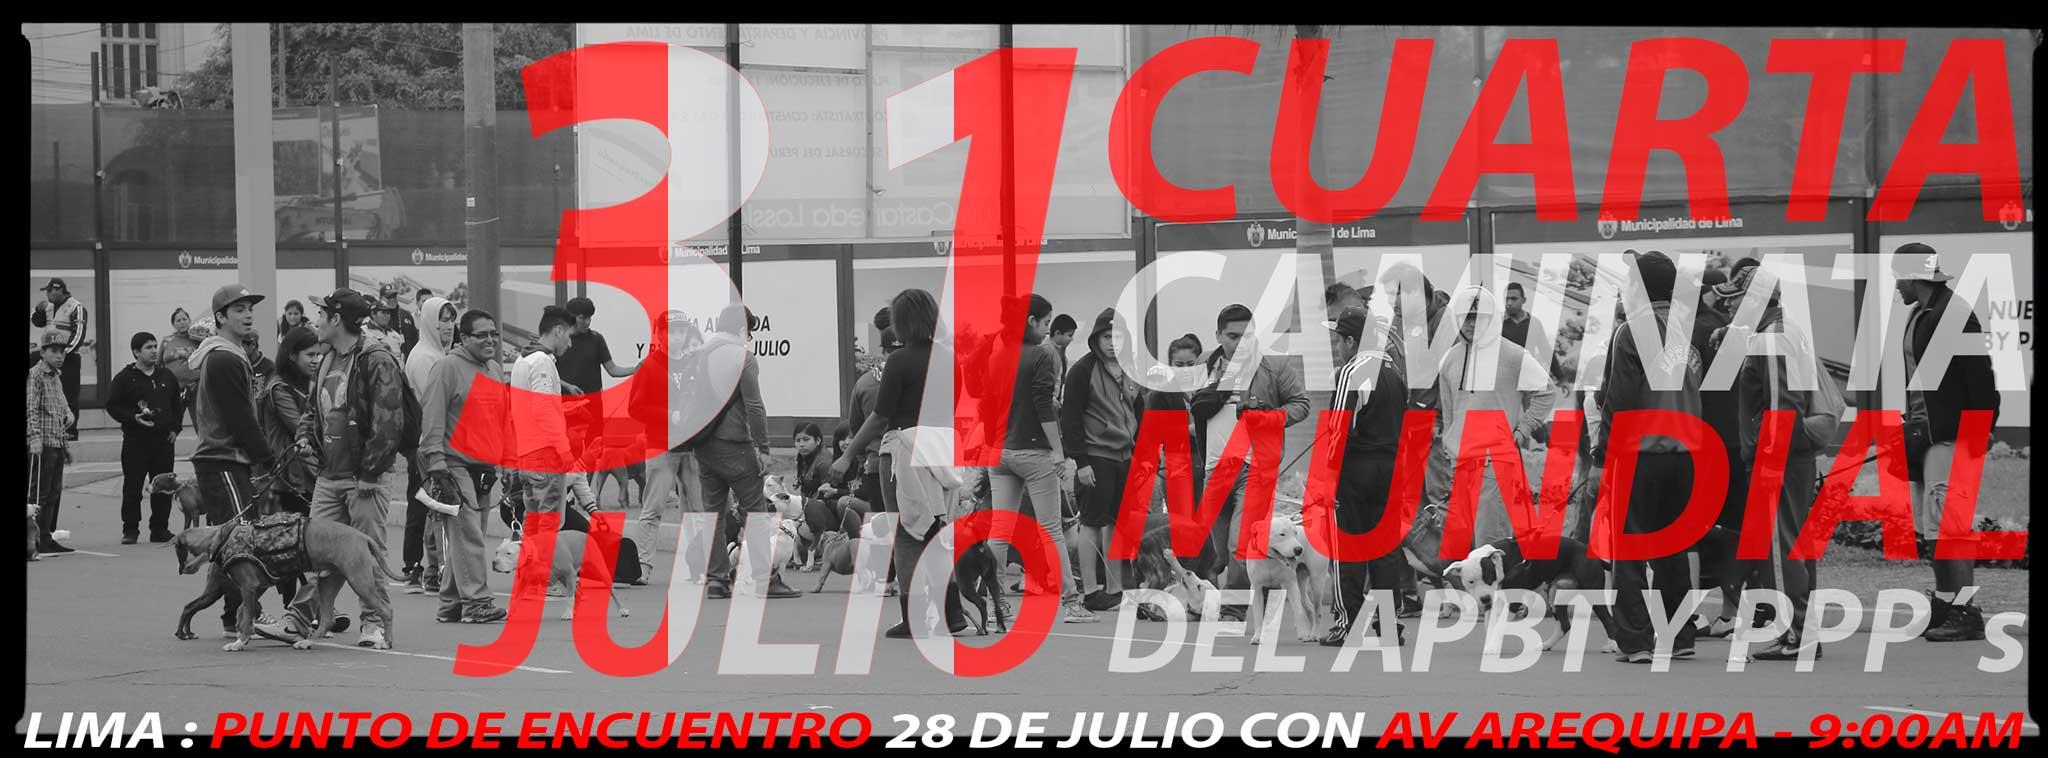 CUARTA CAMINATA PITBULL MUNDIAL 31 de JULIO 2016 / Hashtag -> #caminatapitbullmundial